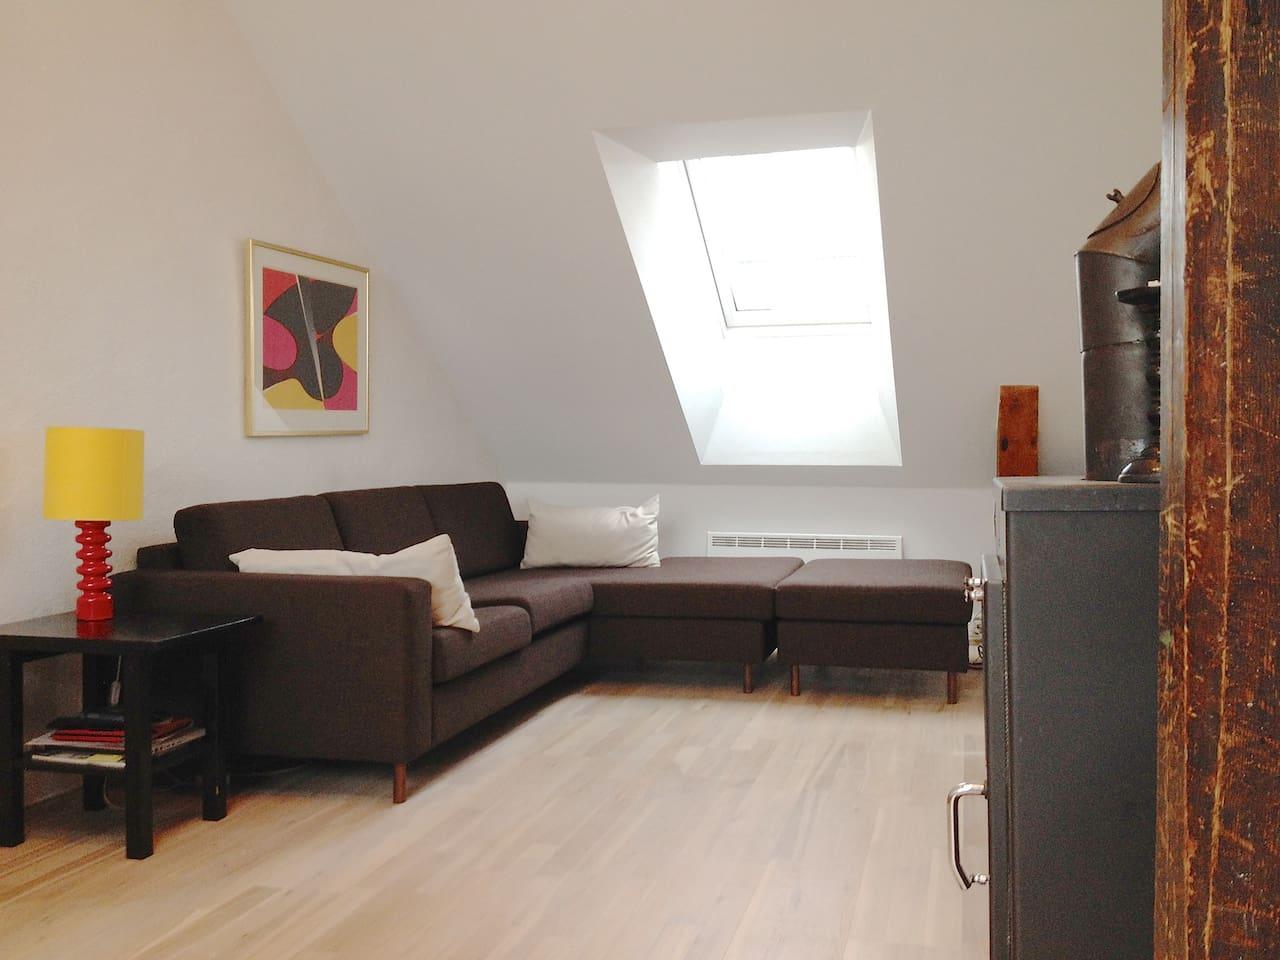 Livingroom with sofa and fireplace